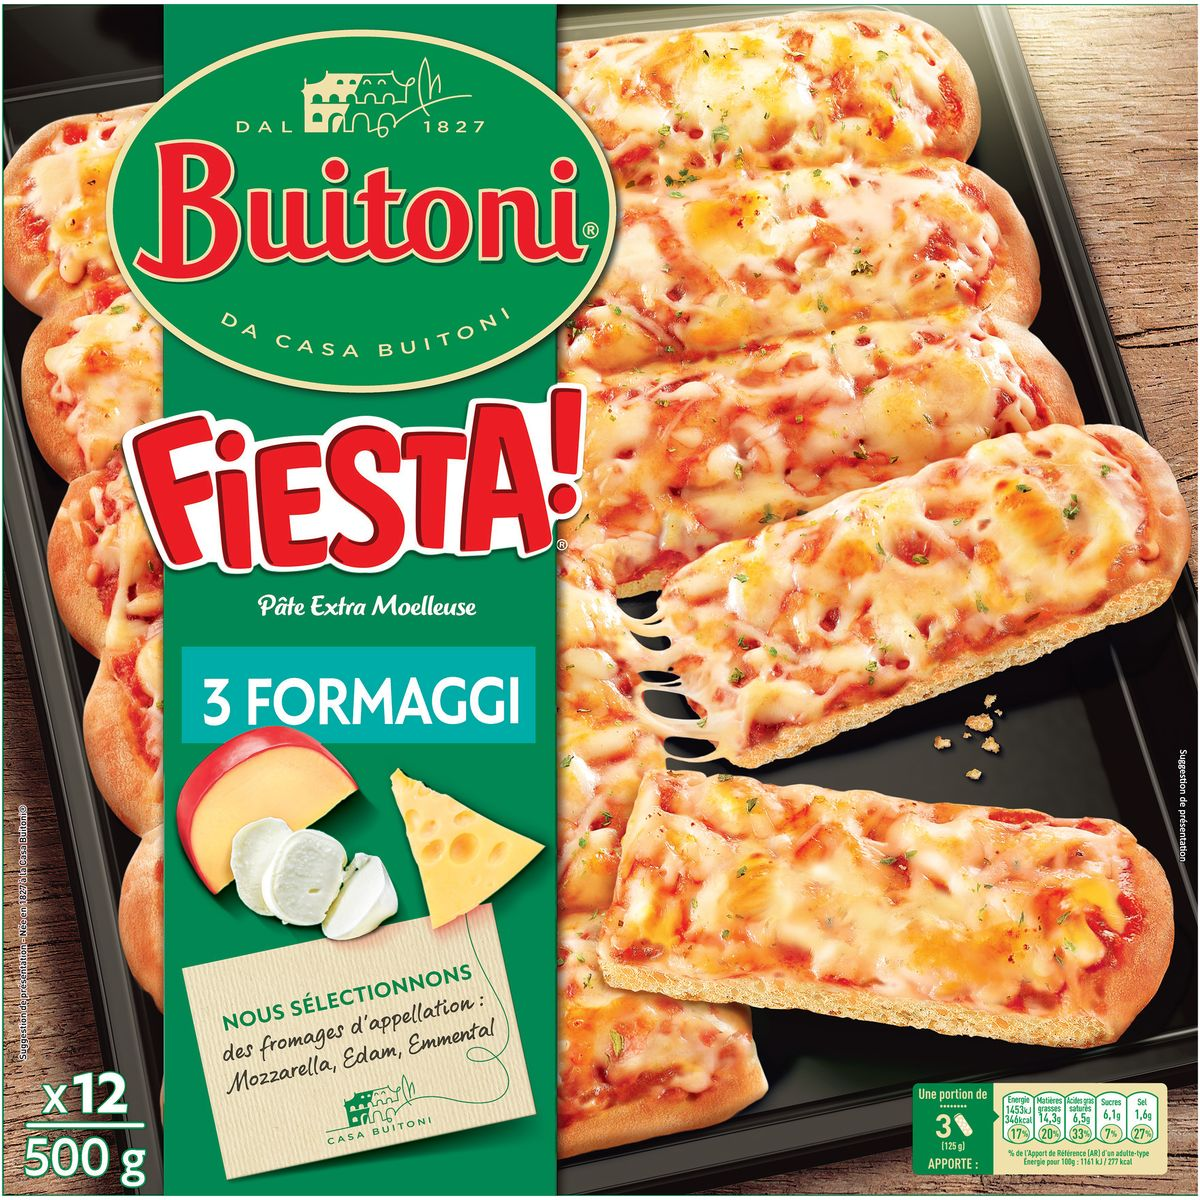 Buitoni Fiesta Pizza 3 Fromages Mozzarella Edam Emmental Et Sa Pate